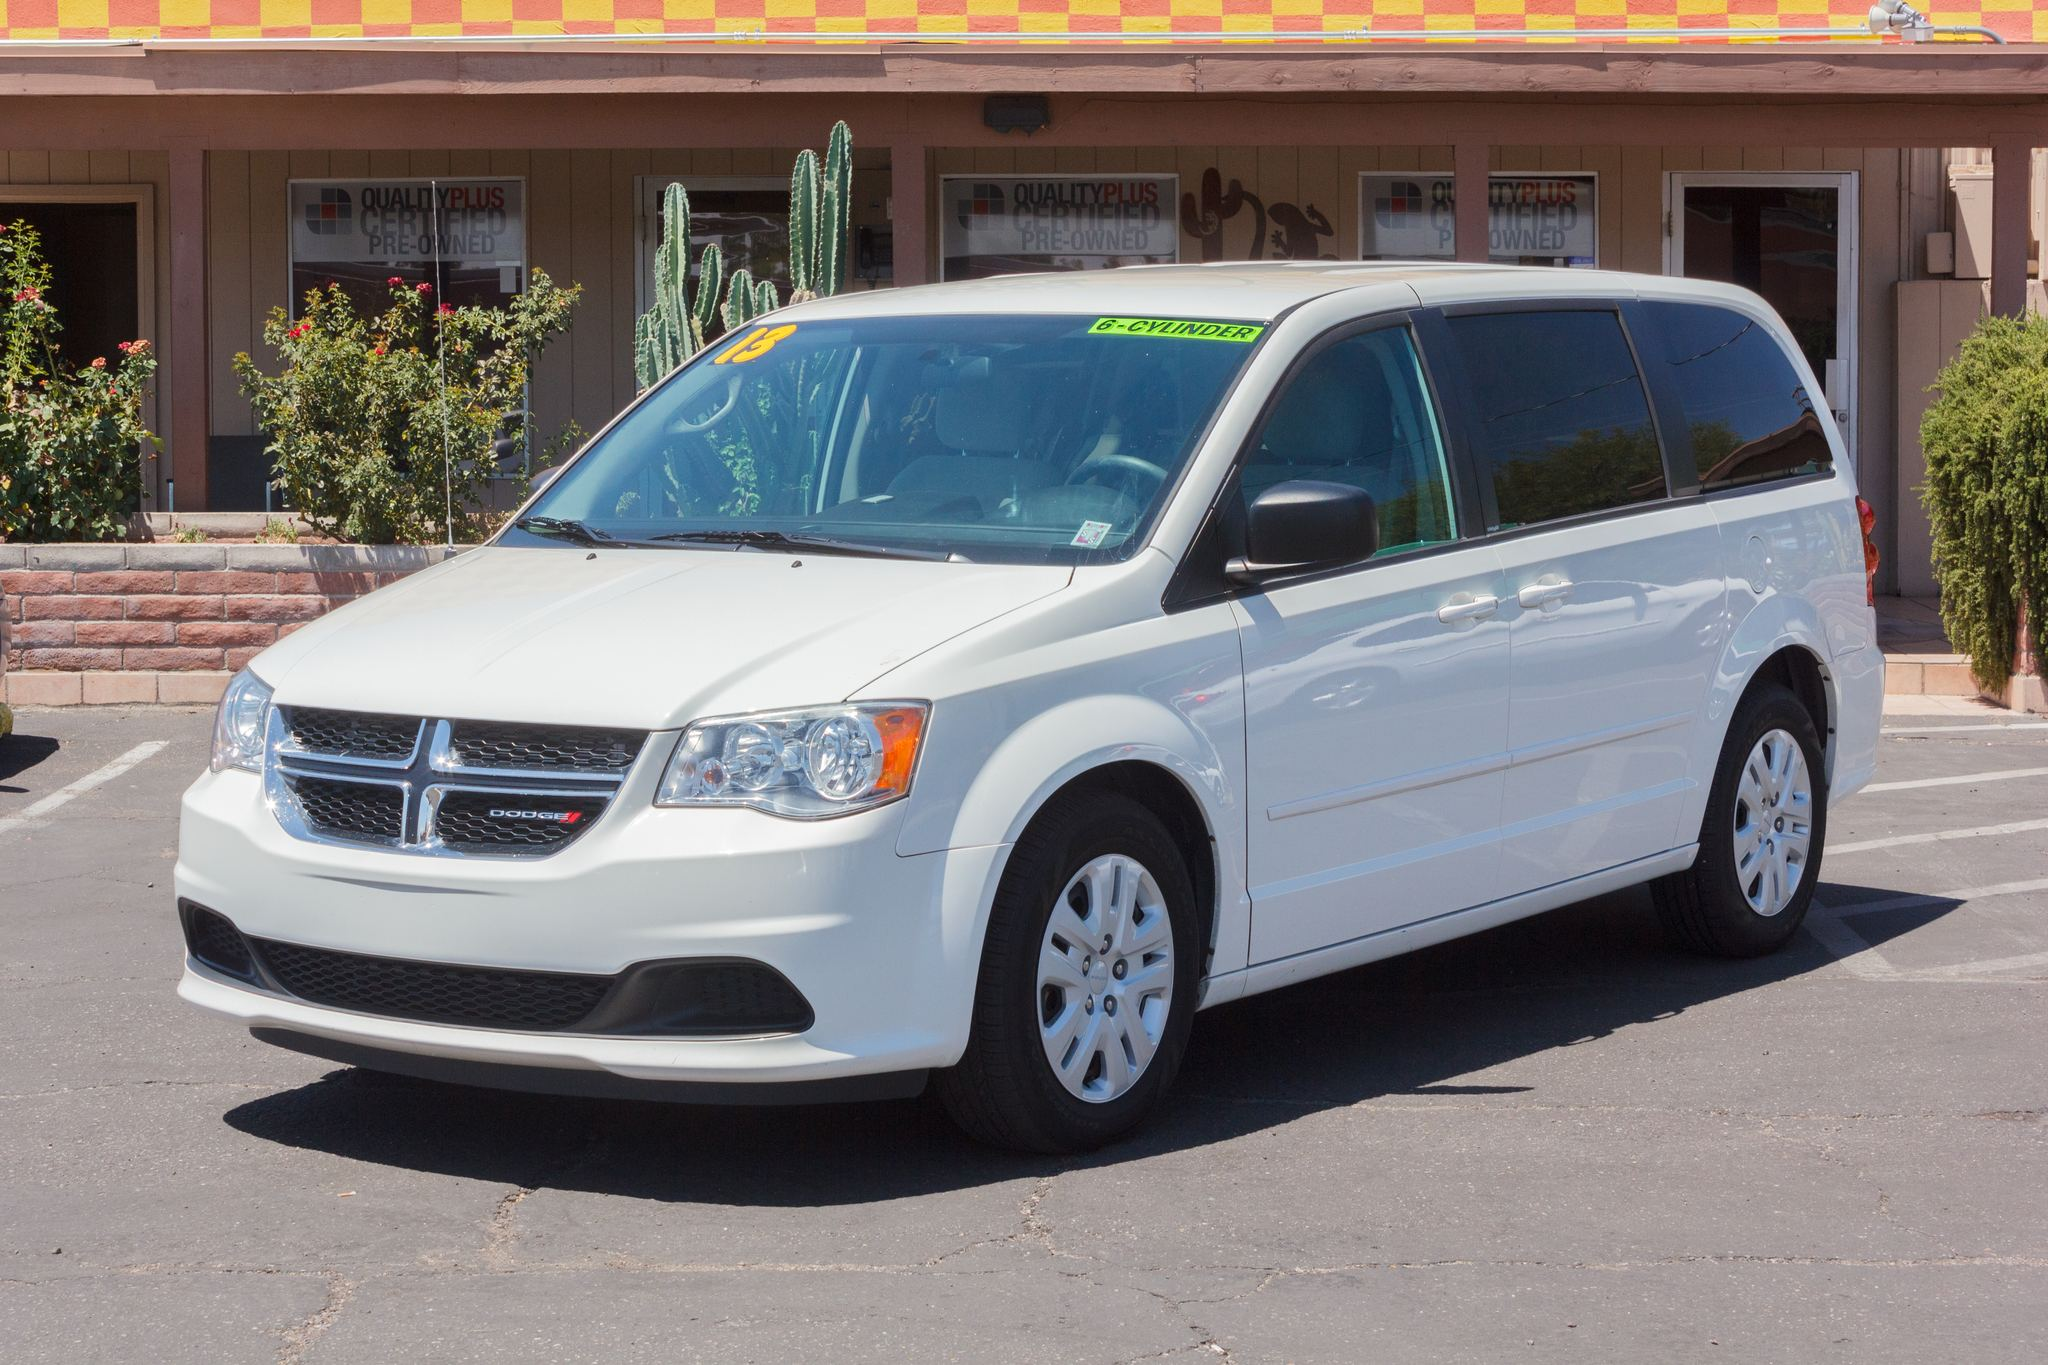 Photo of 2013 Dodge Grand Caravan 4d Wagon SE White